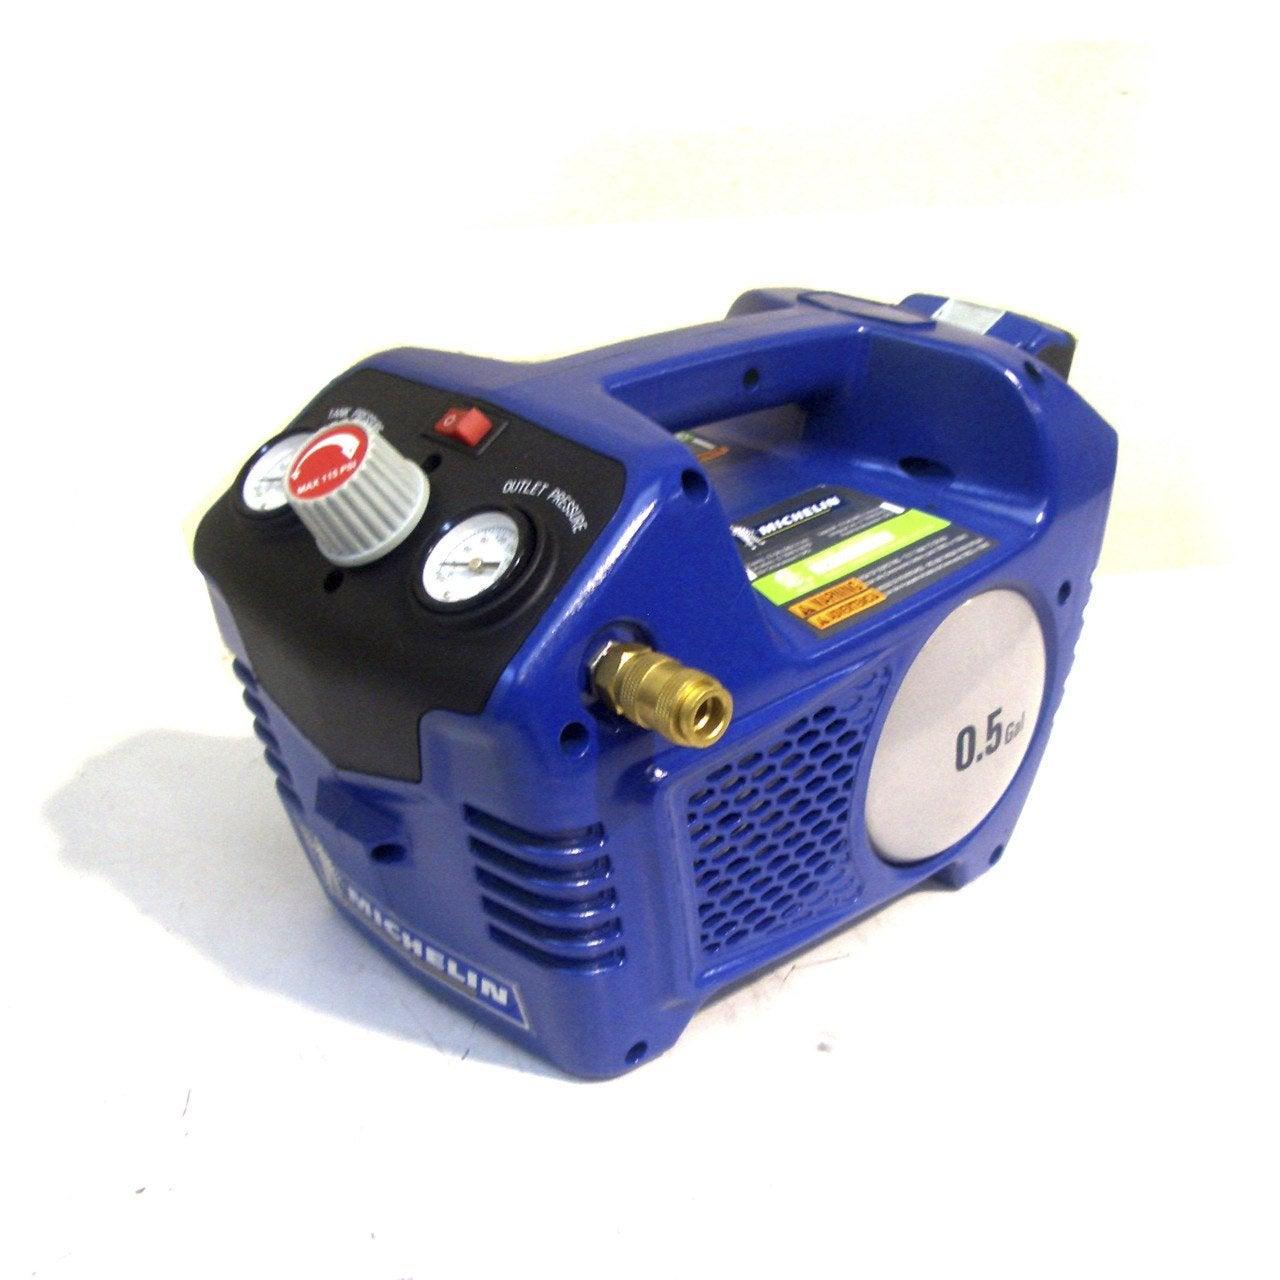 Compresseur de chantier michelin 2 l 0 5 cv leroy merlin - Transformateur 220v 12v leroy merlin ...